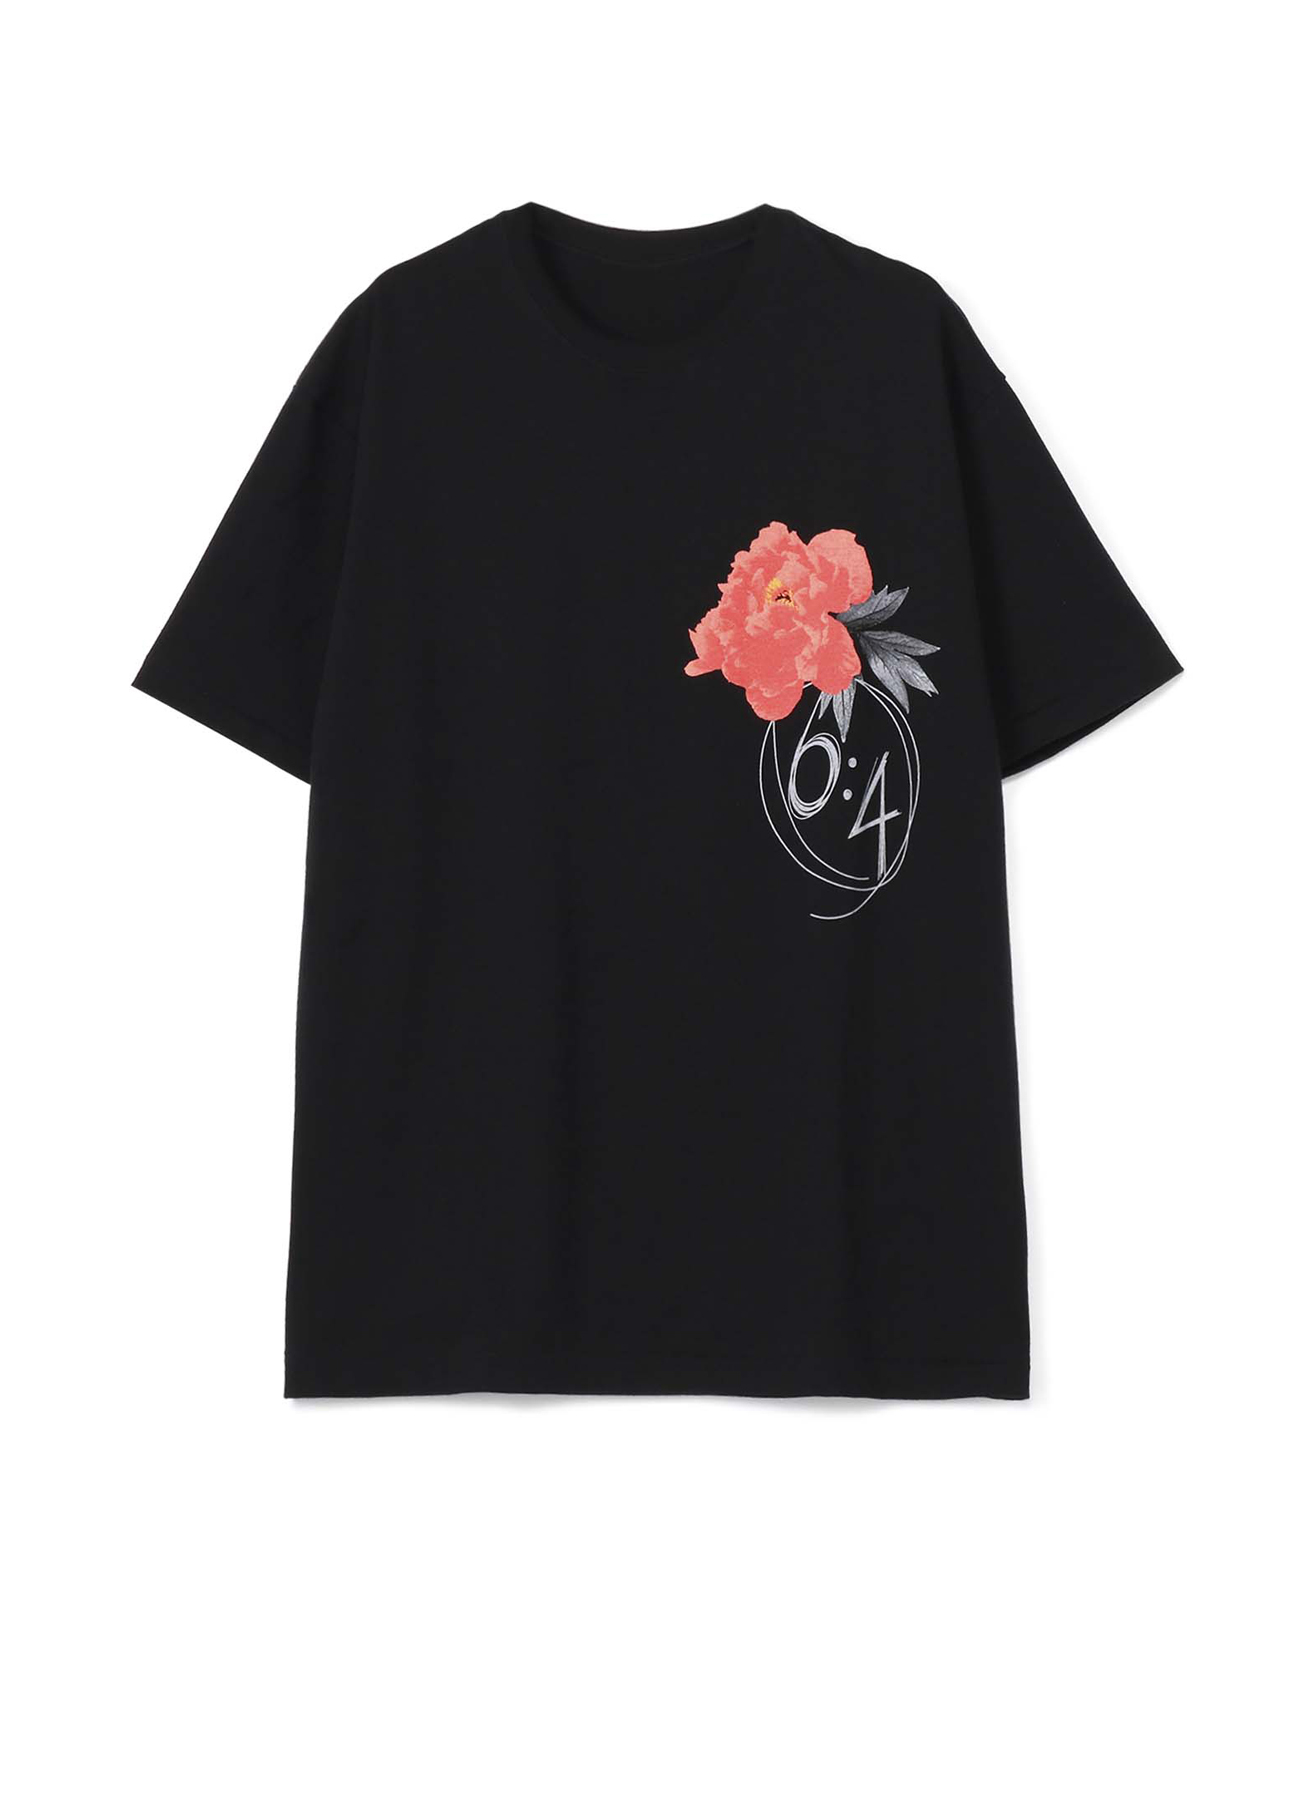 Red Peony Flower ×6:4 T恤